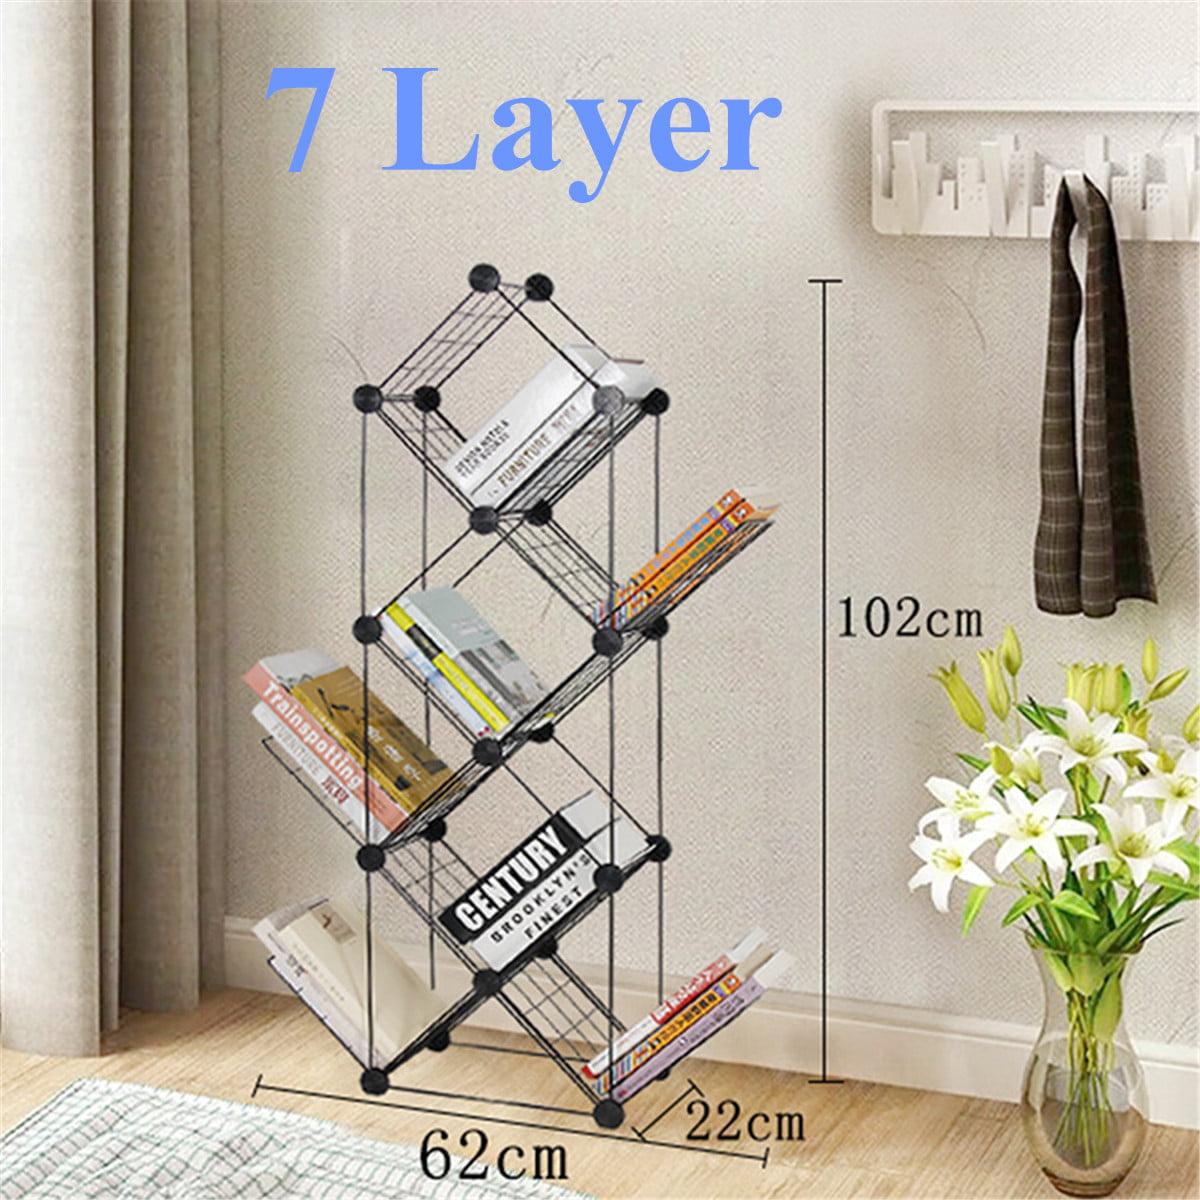 7 9 Layer Iron Book Case Shelf Bedroom Bookcase Bookshelf Home Decor Gift Walmart Canada